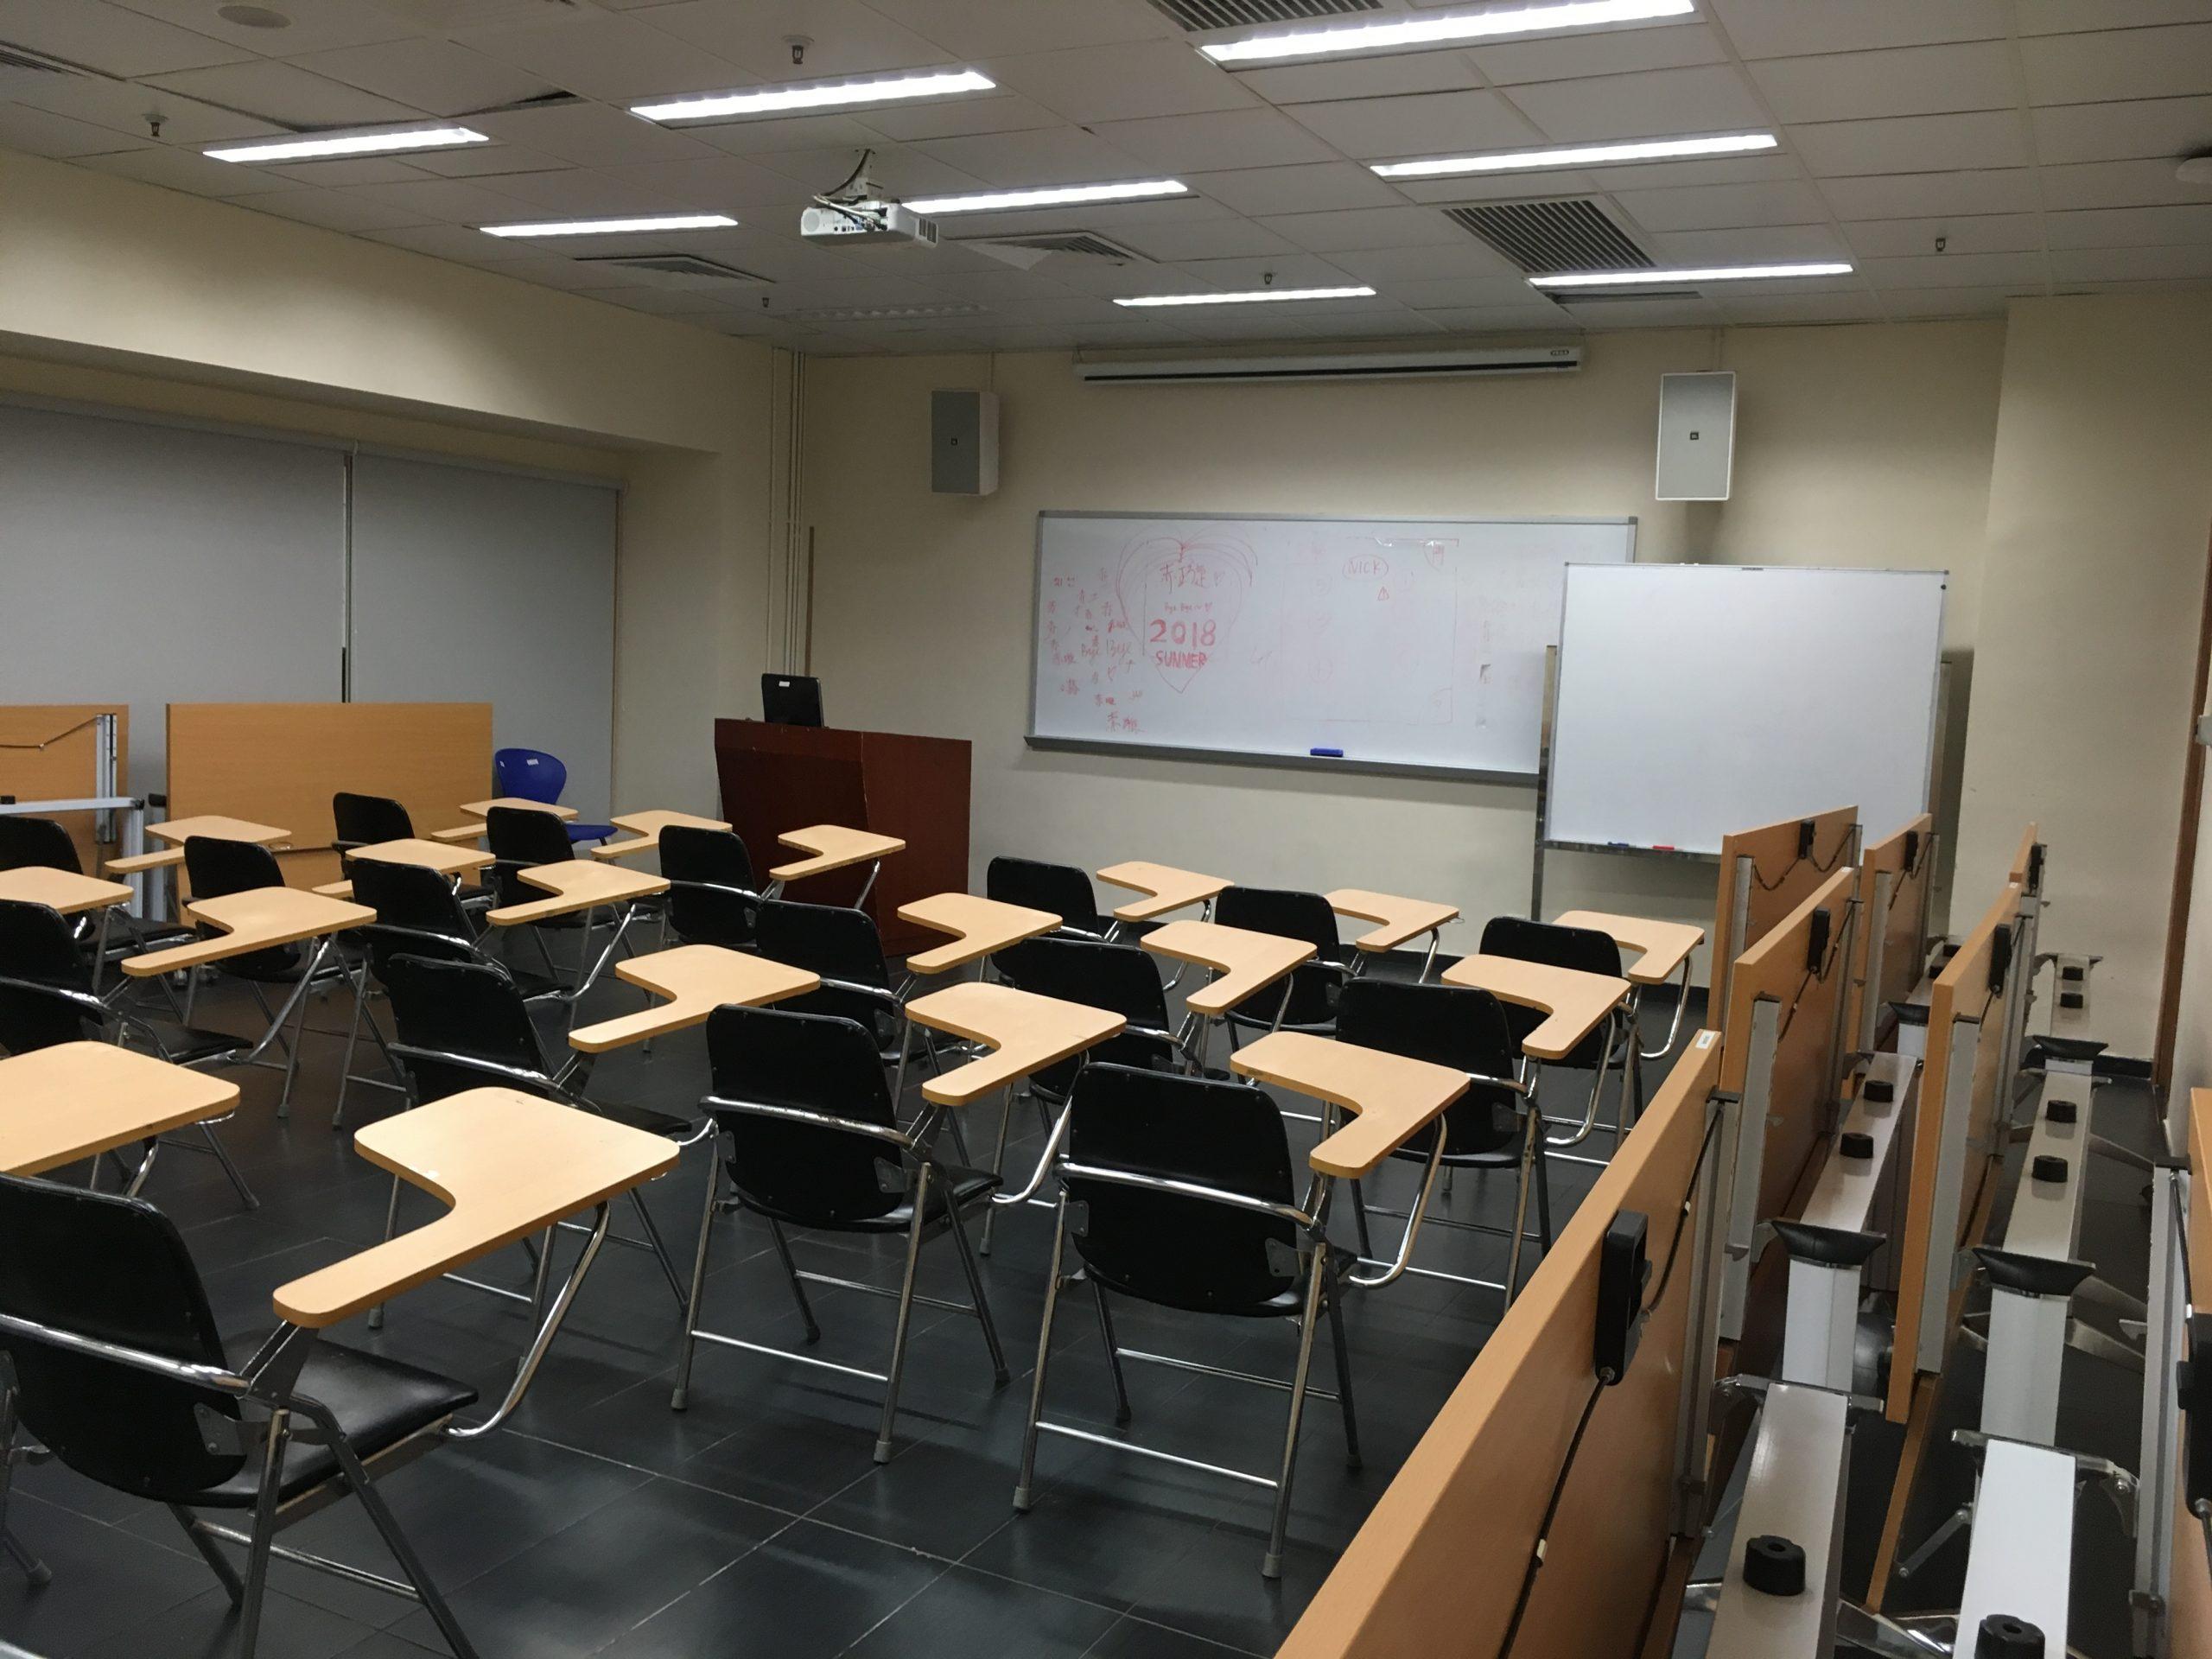 Anthony Wu Seminar Room 胡定旭演講室